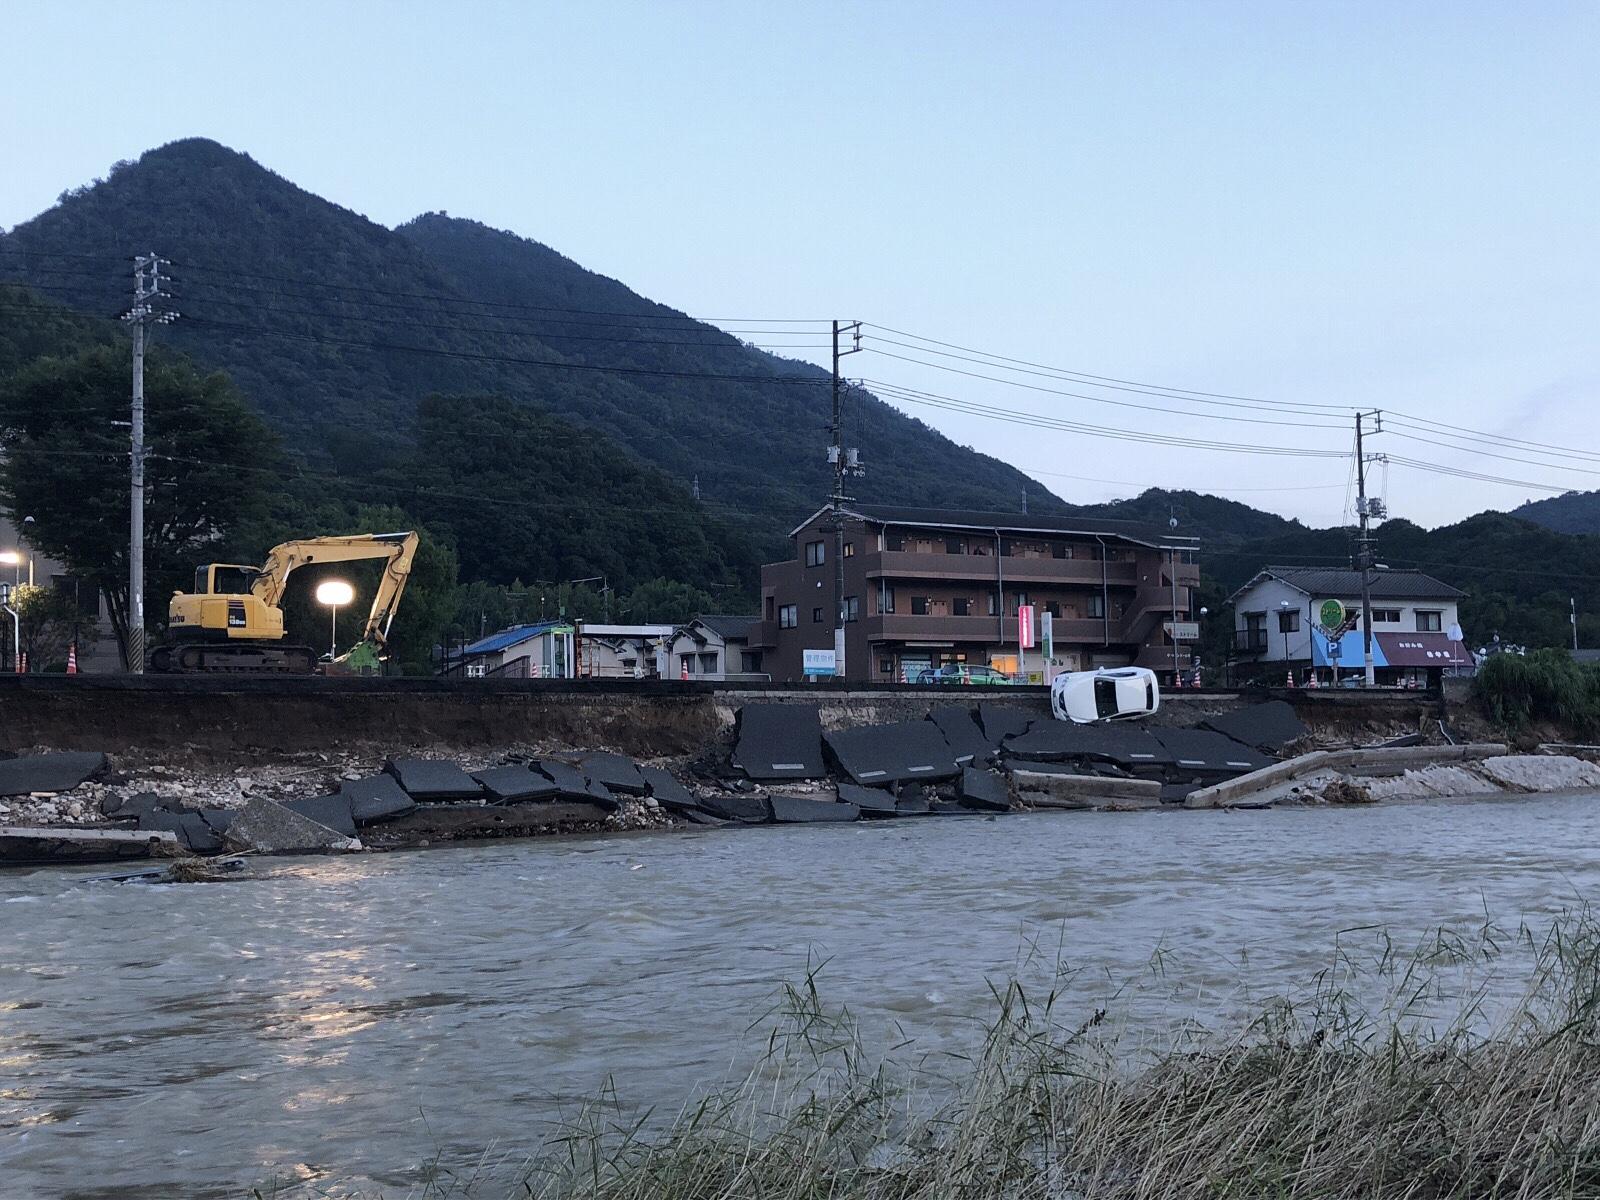 2018.7.10 広島市安芸区中野地区被災状況   紙楽社の主の日常